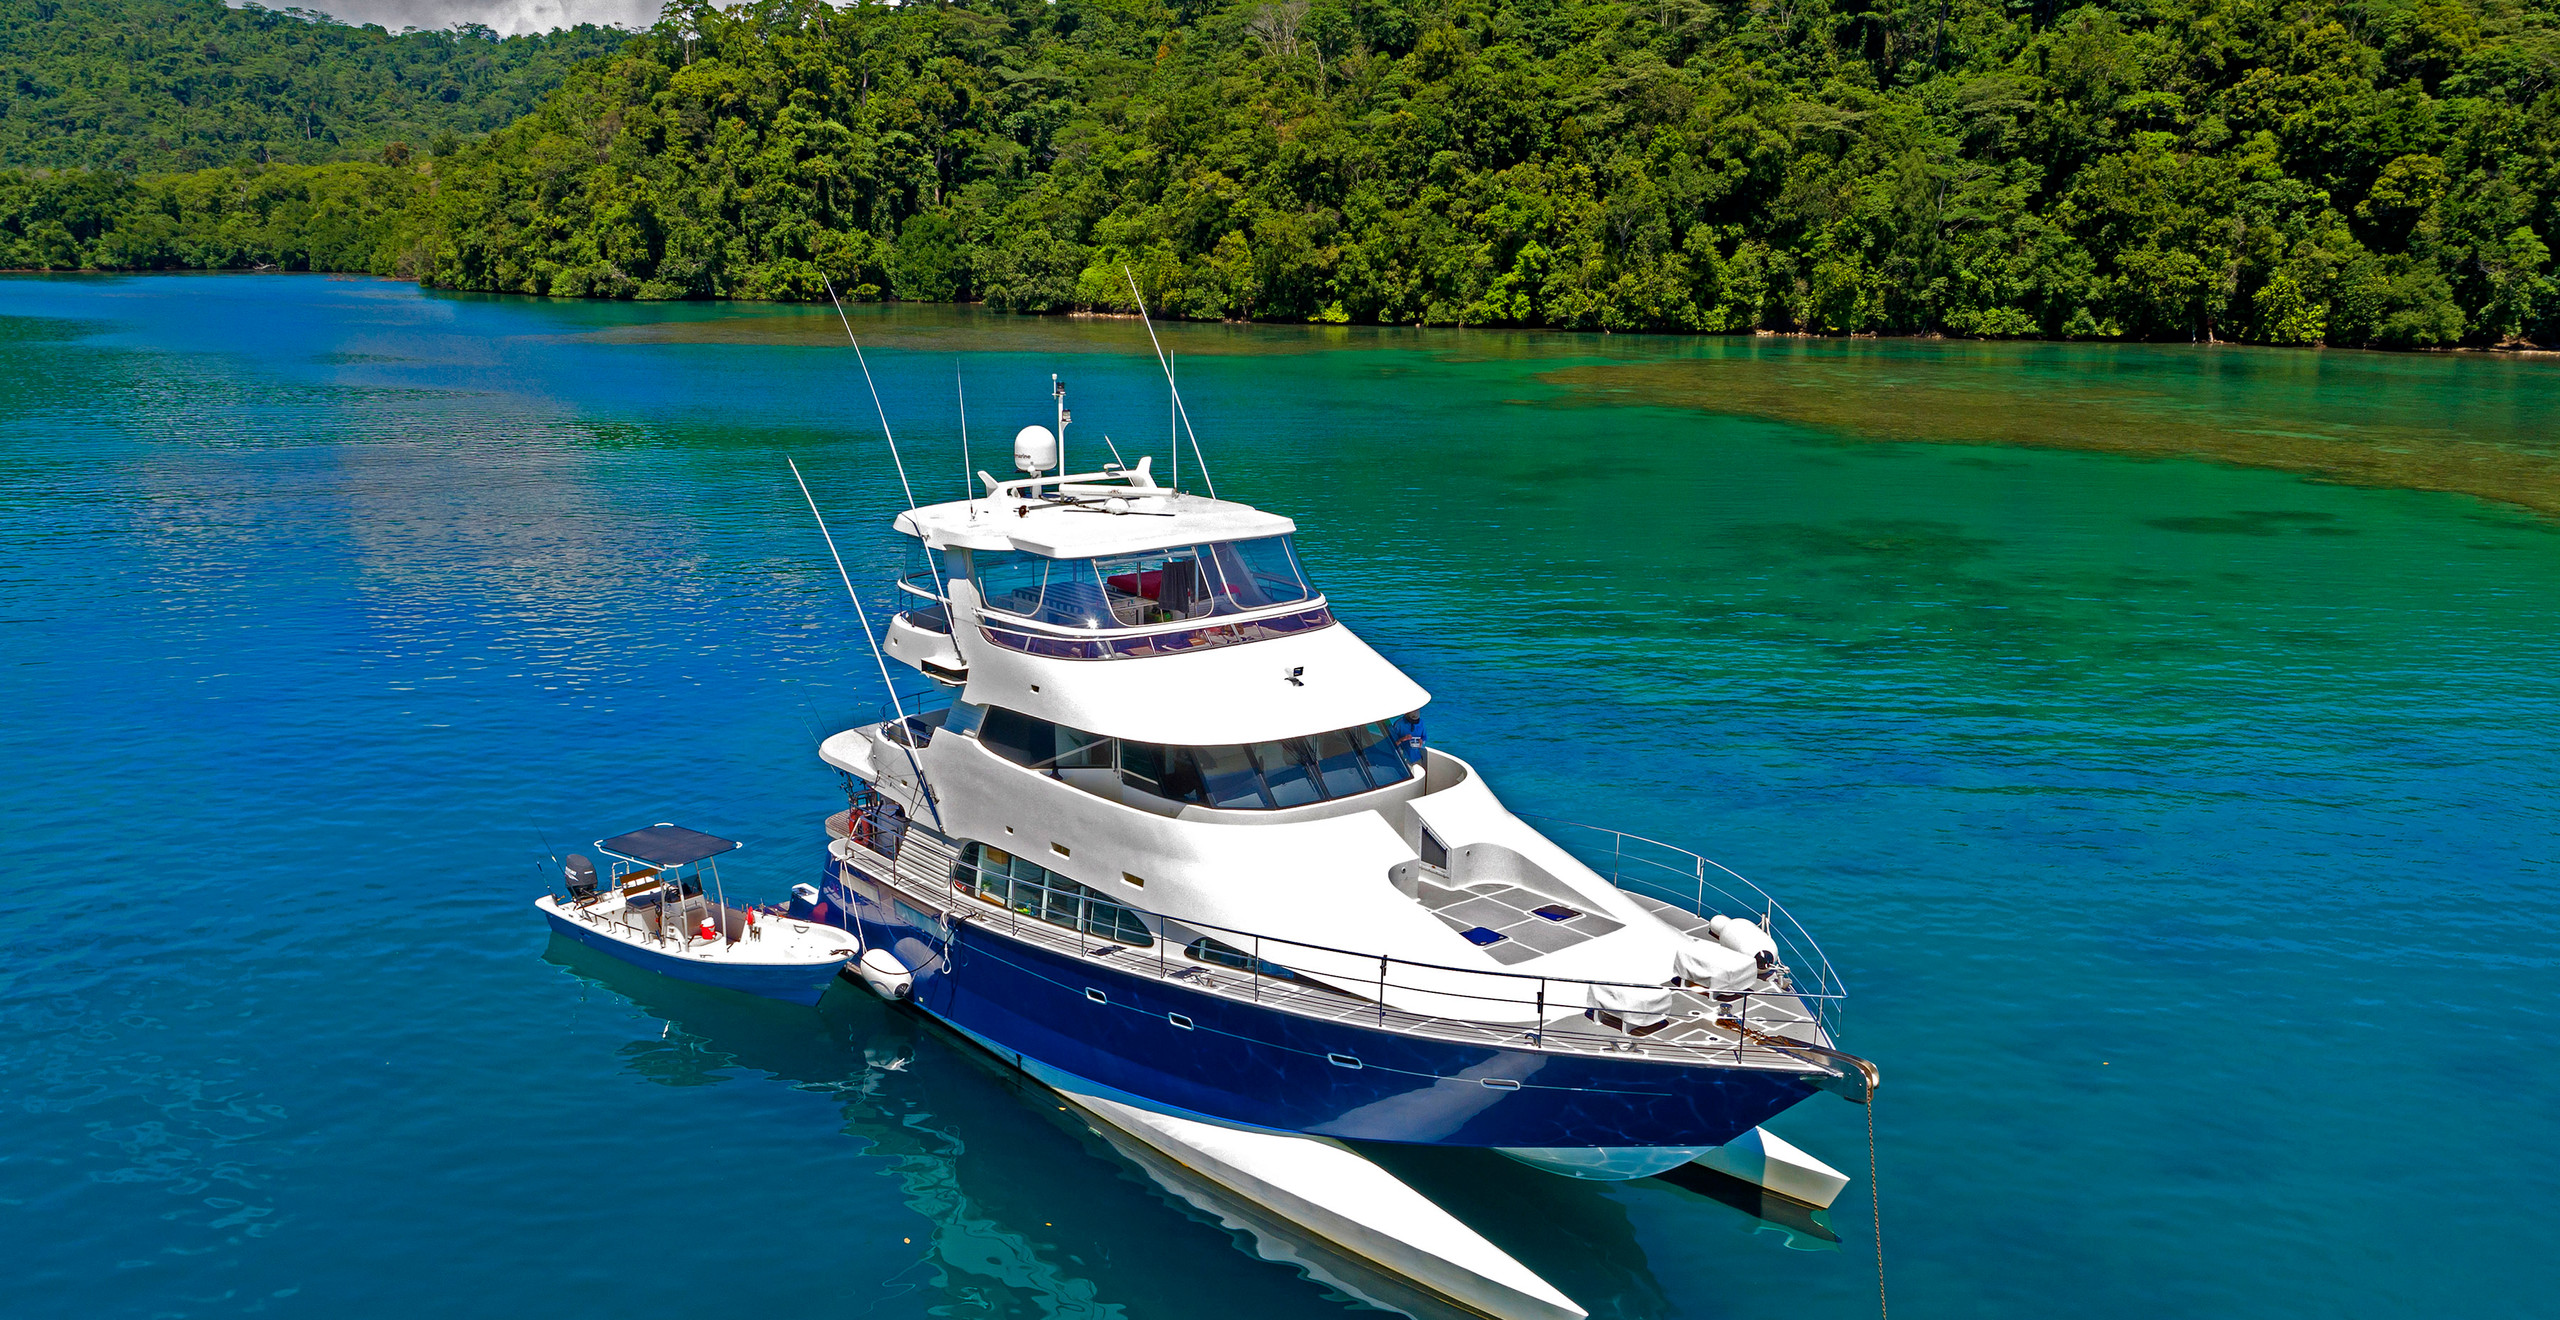 Ultimate One - Papua New Guinea Fishing & Holidays